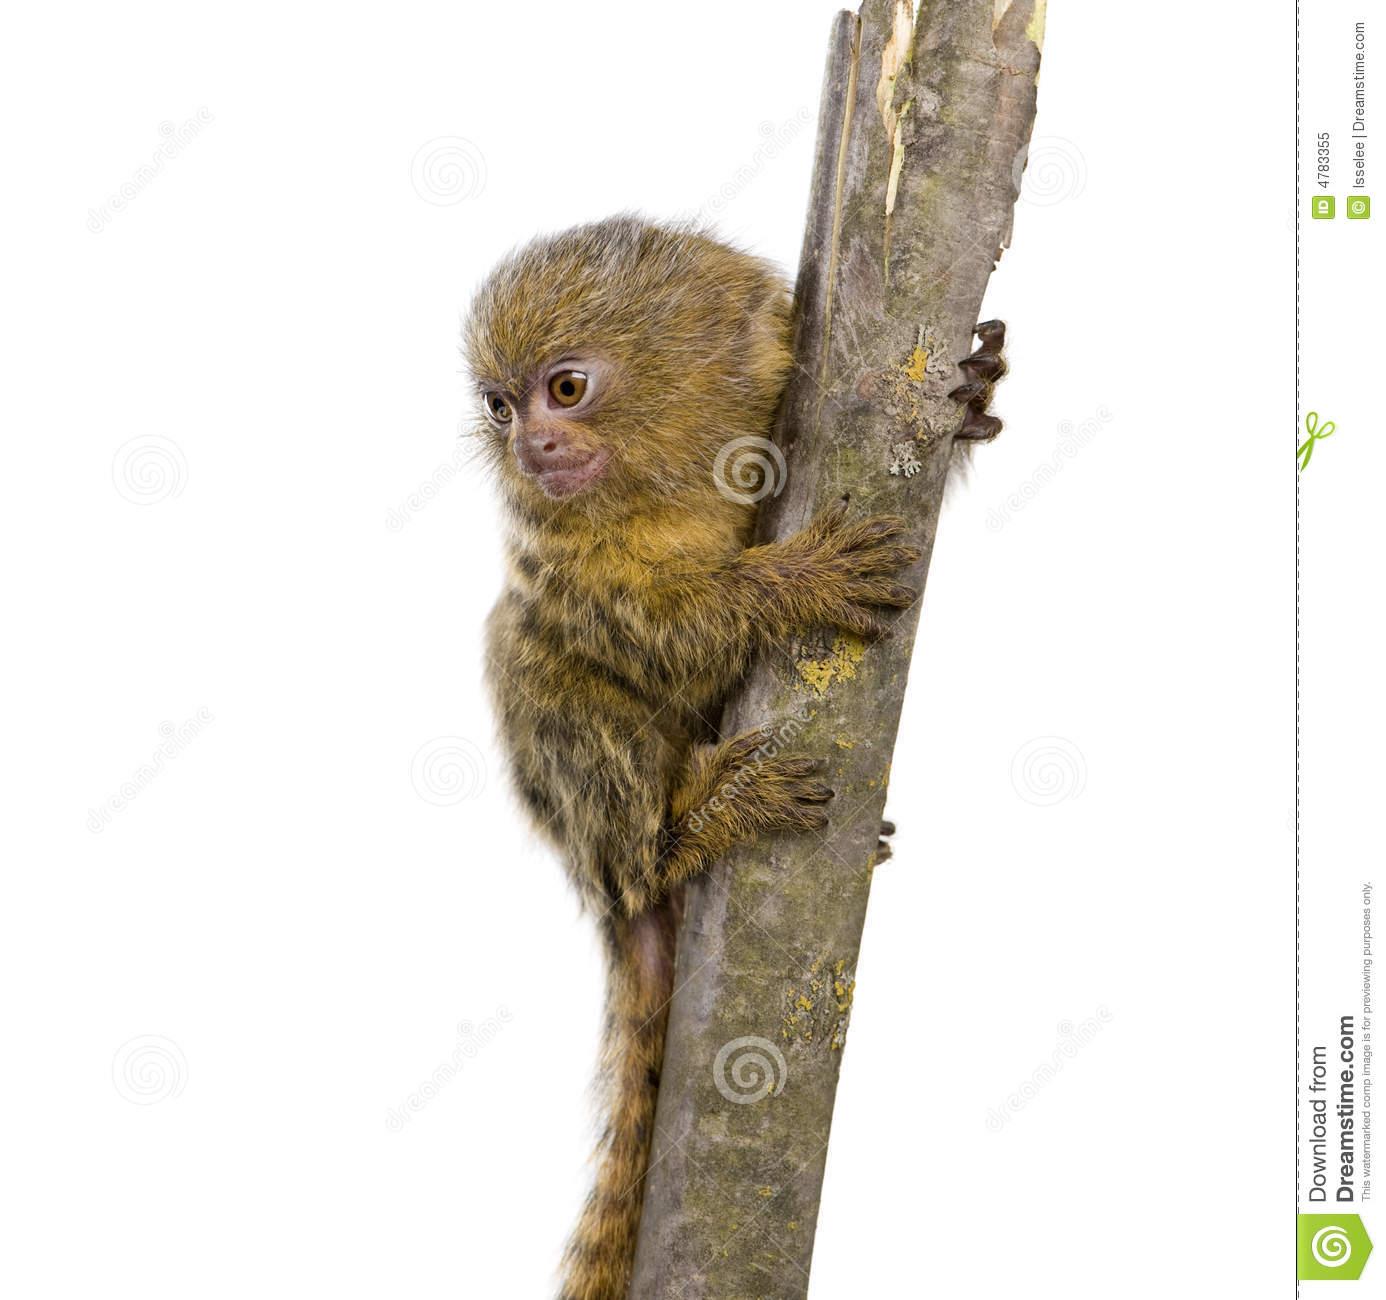 Pygmy Marmoset Monkey Stock Photos, Images, & Pictures.